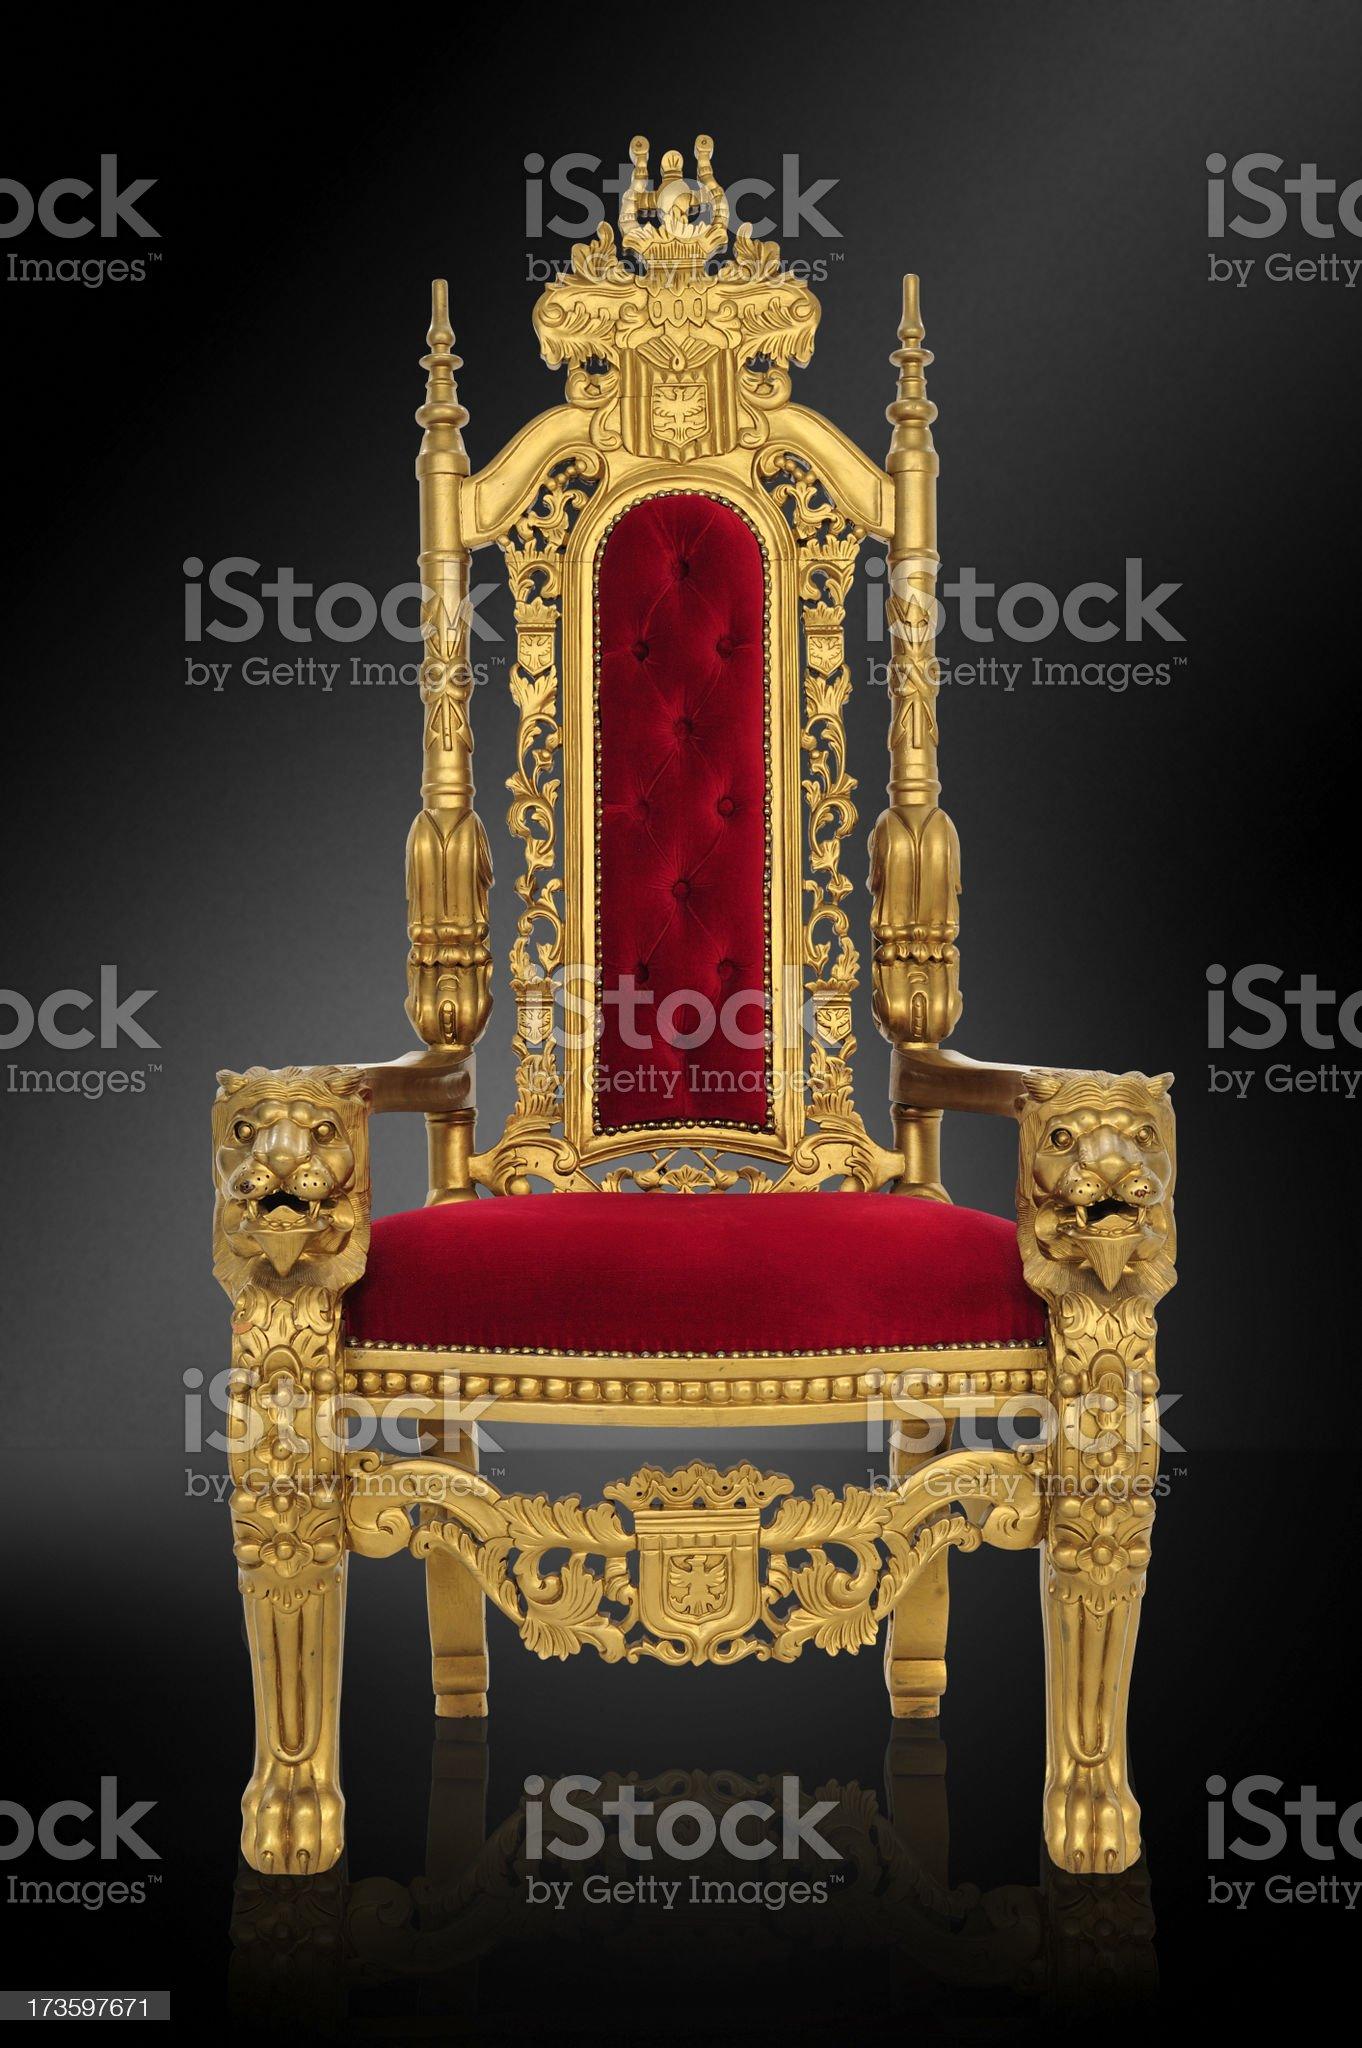 Royal Throne royalty-free stock photo